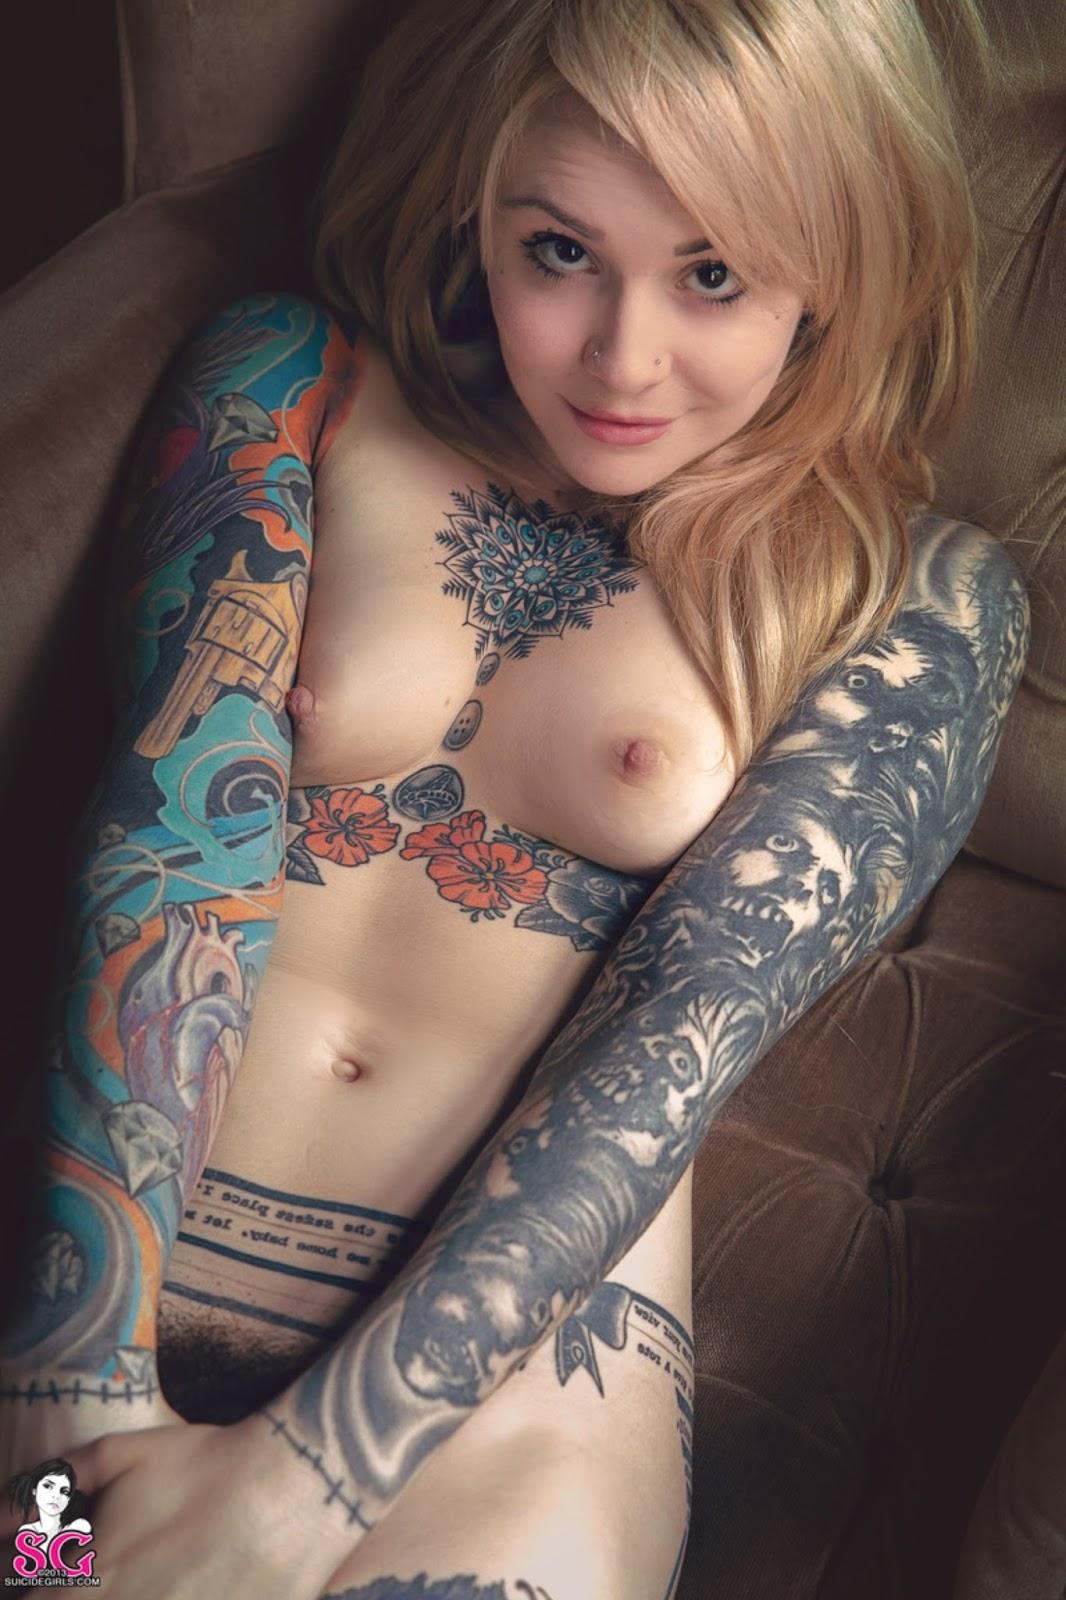 Tattoo  Ink Suicidegirls - Casper - Guest Room-8267